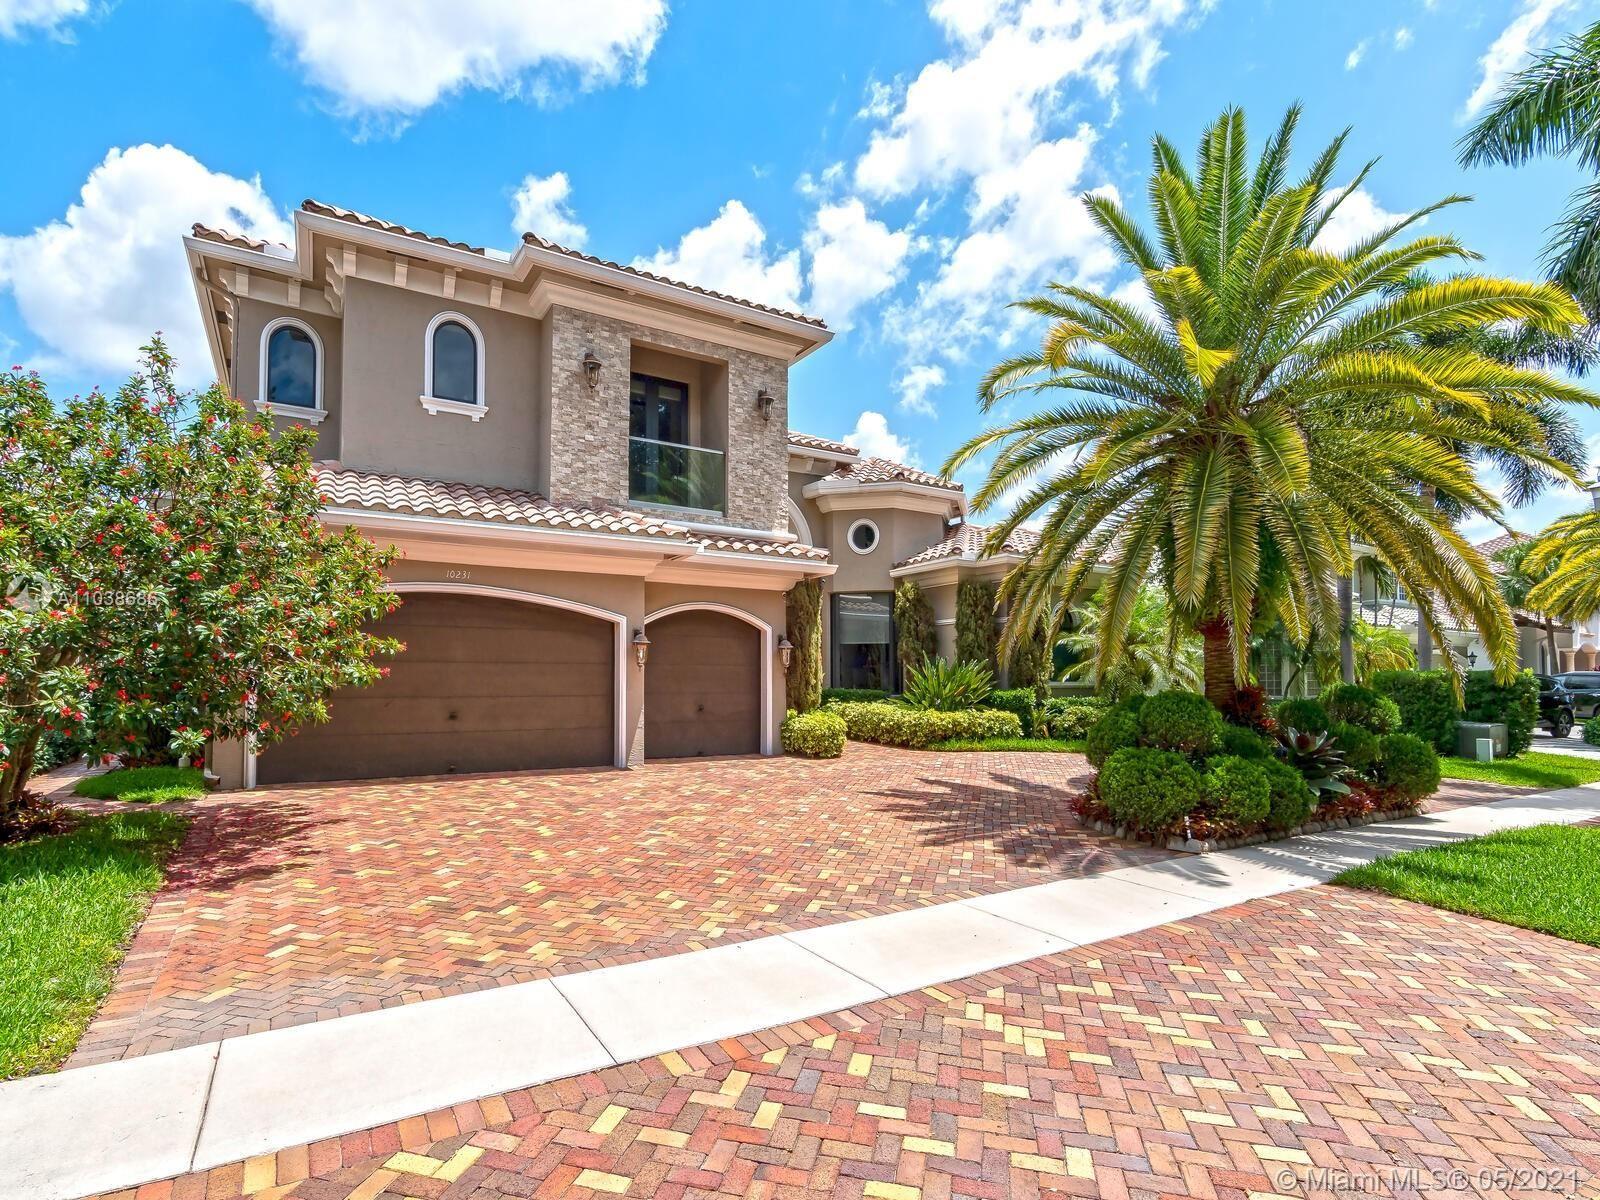 Photo of 10231 Blue Palm St, Plantation, FL 33324 (MLS # A11038686)